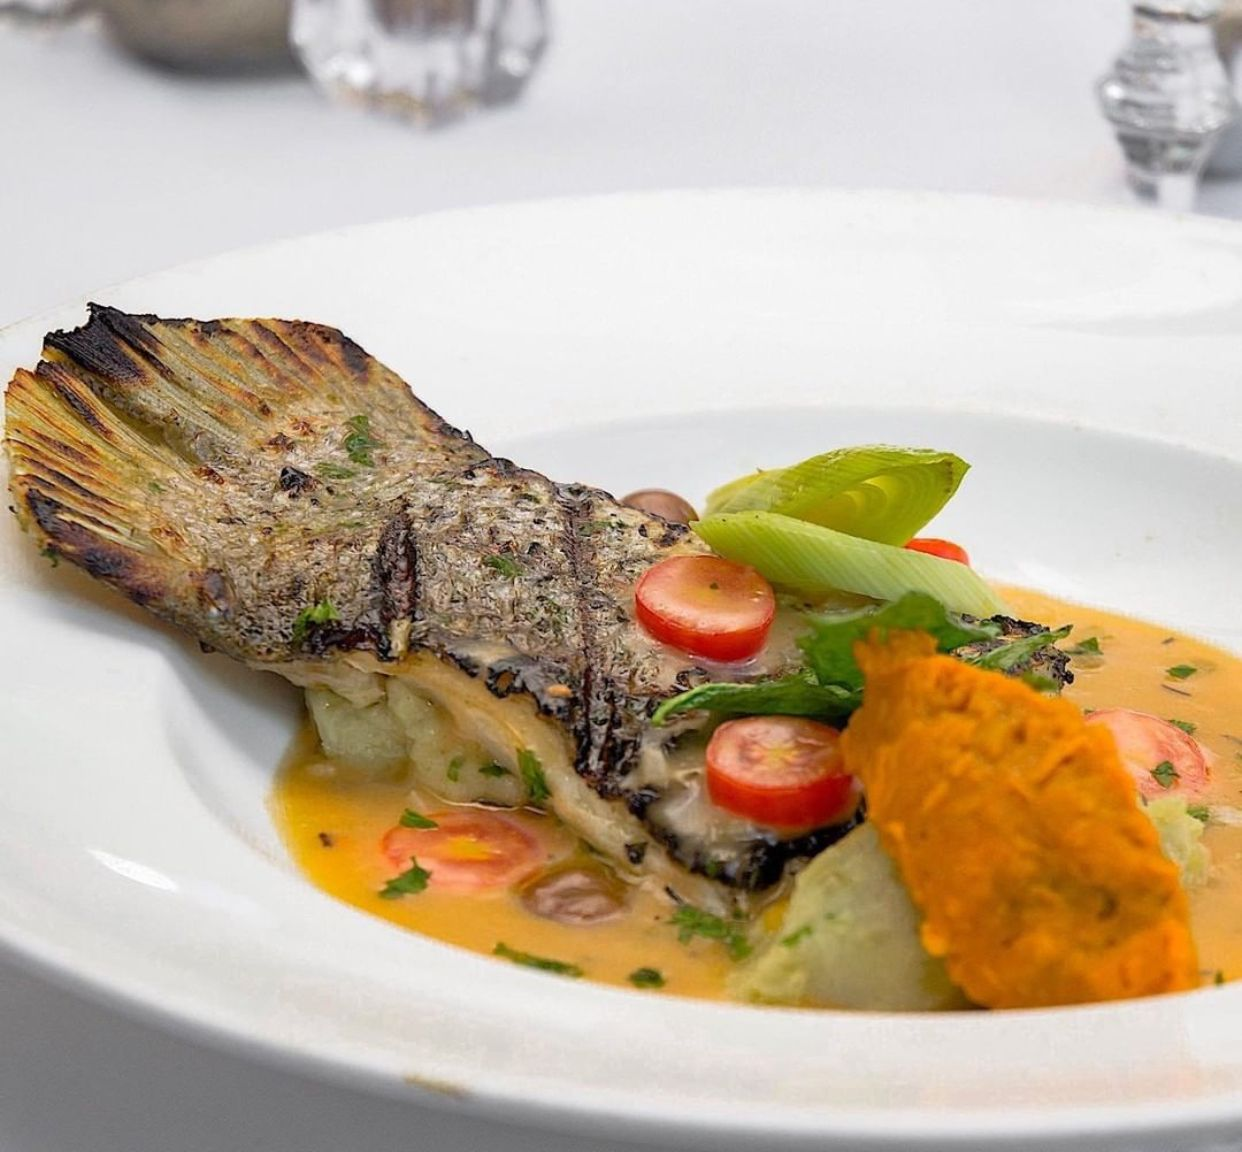 Terra Nova Restaurant Jamaica (With images) Jamaican